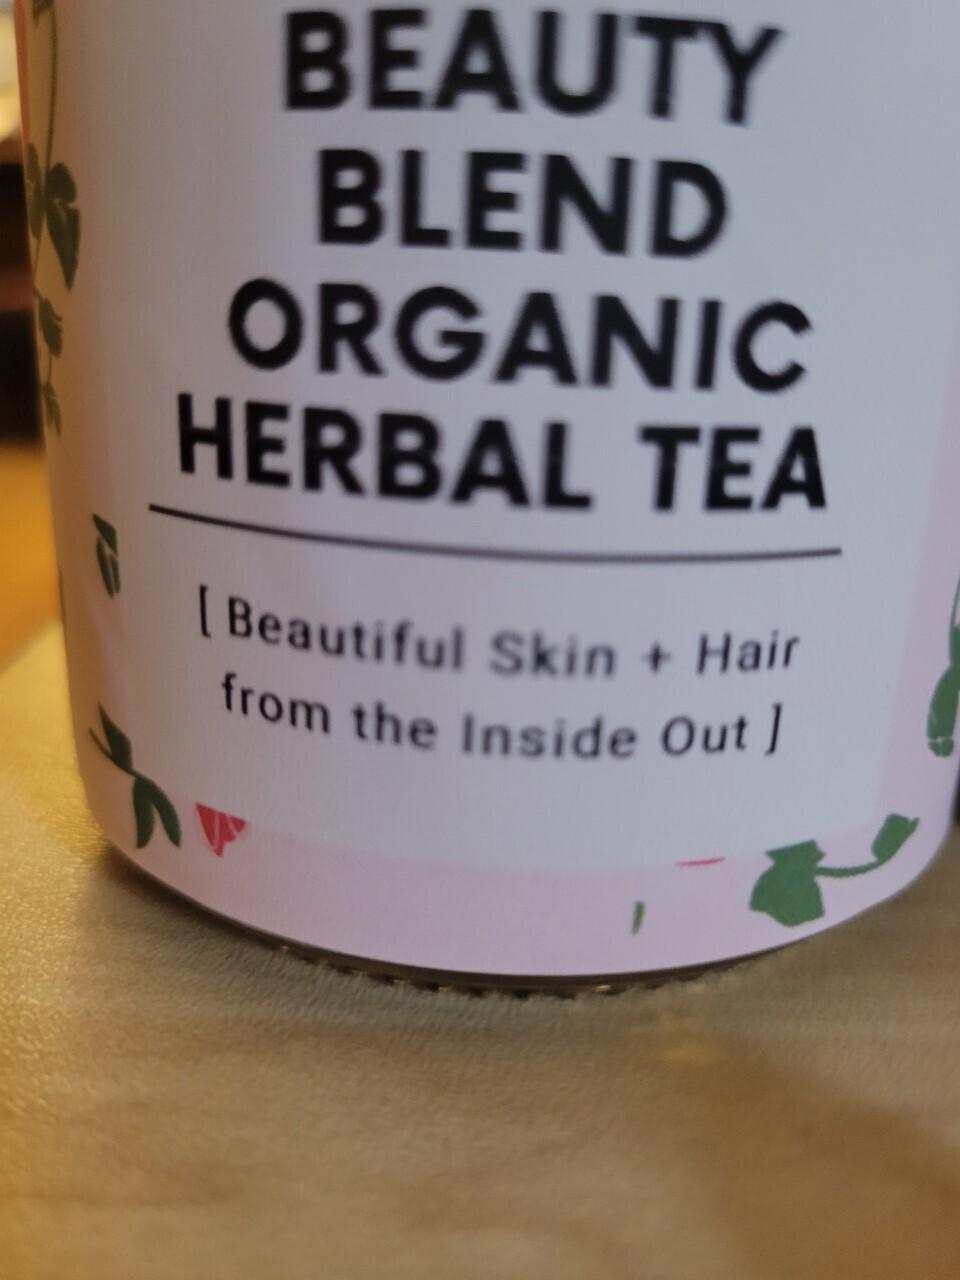 Tea- Organic Herbal Tea Blend